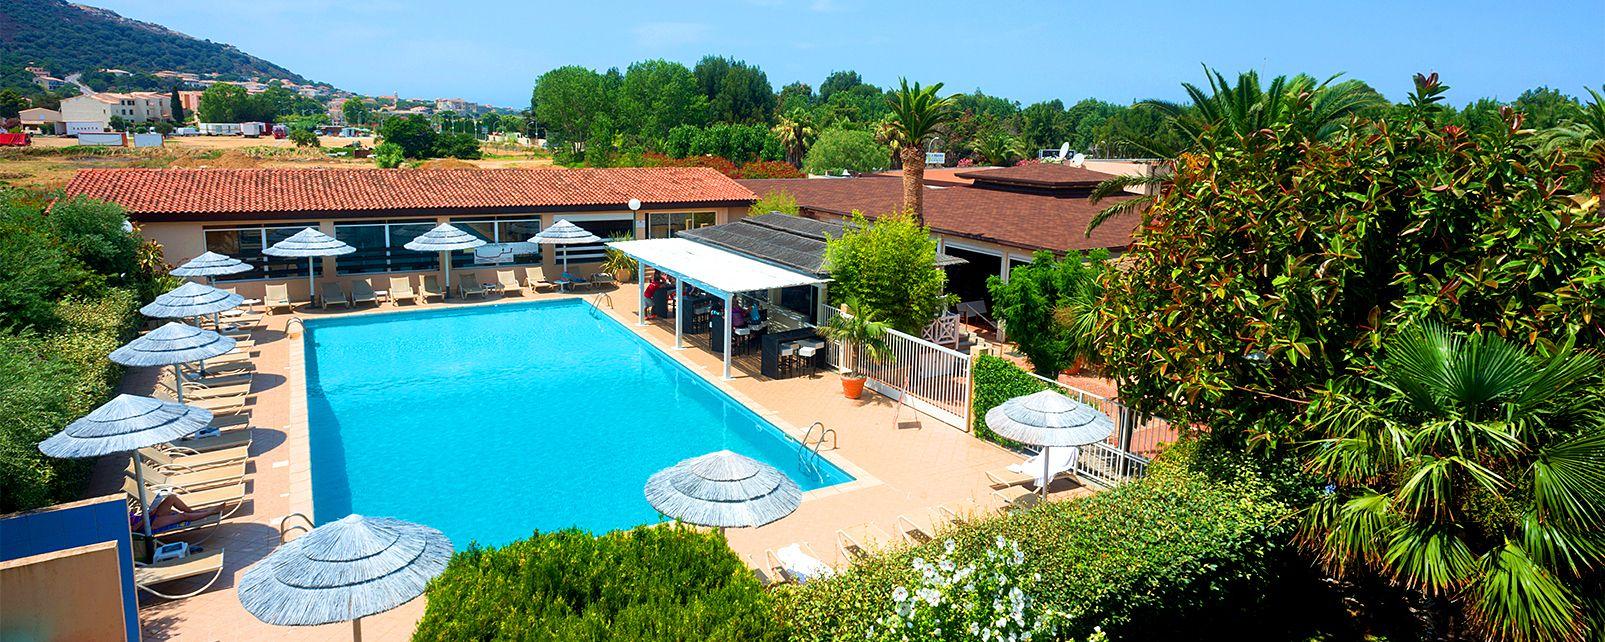 Club Lookéa Corsica Paoli